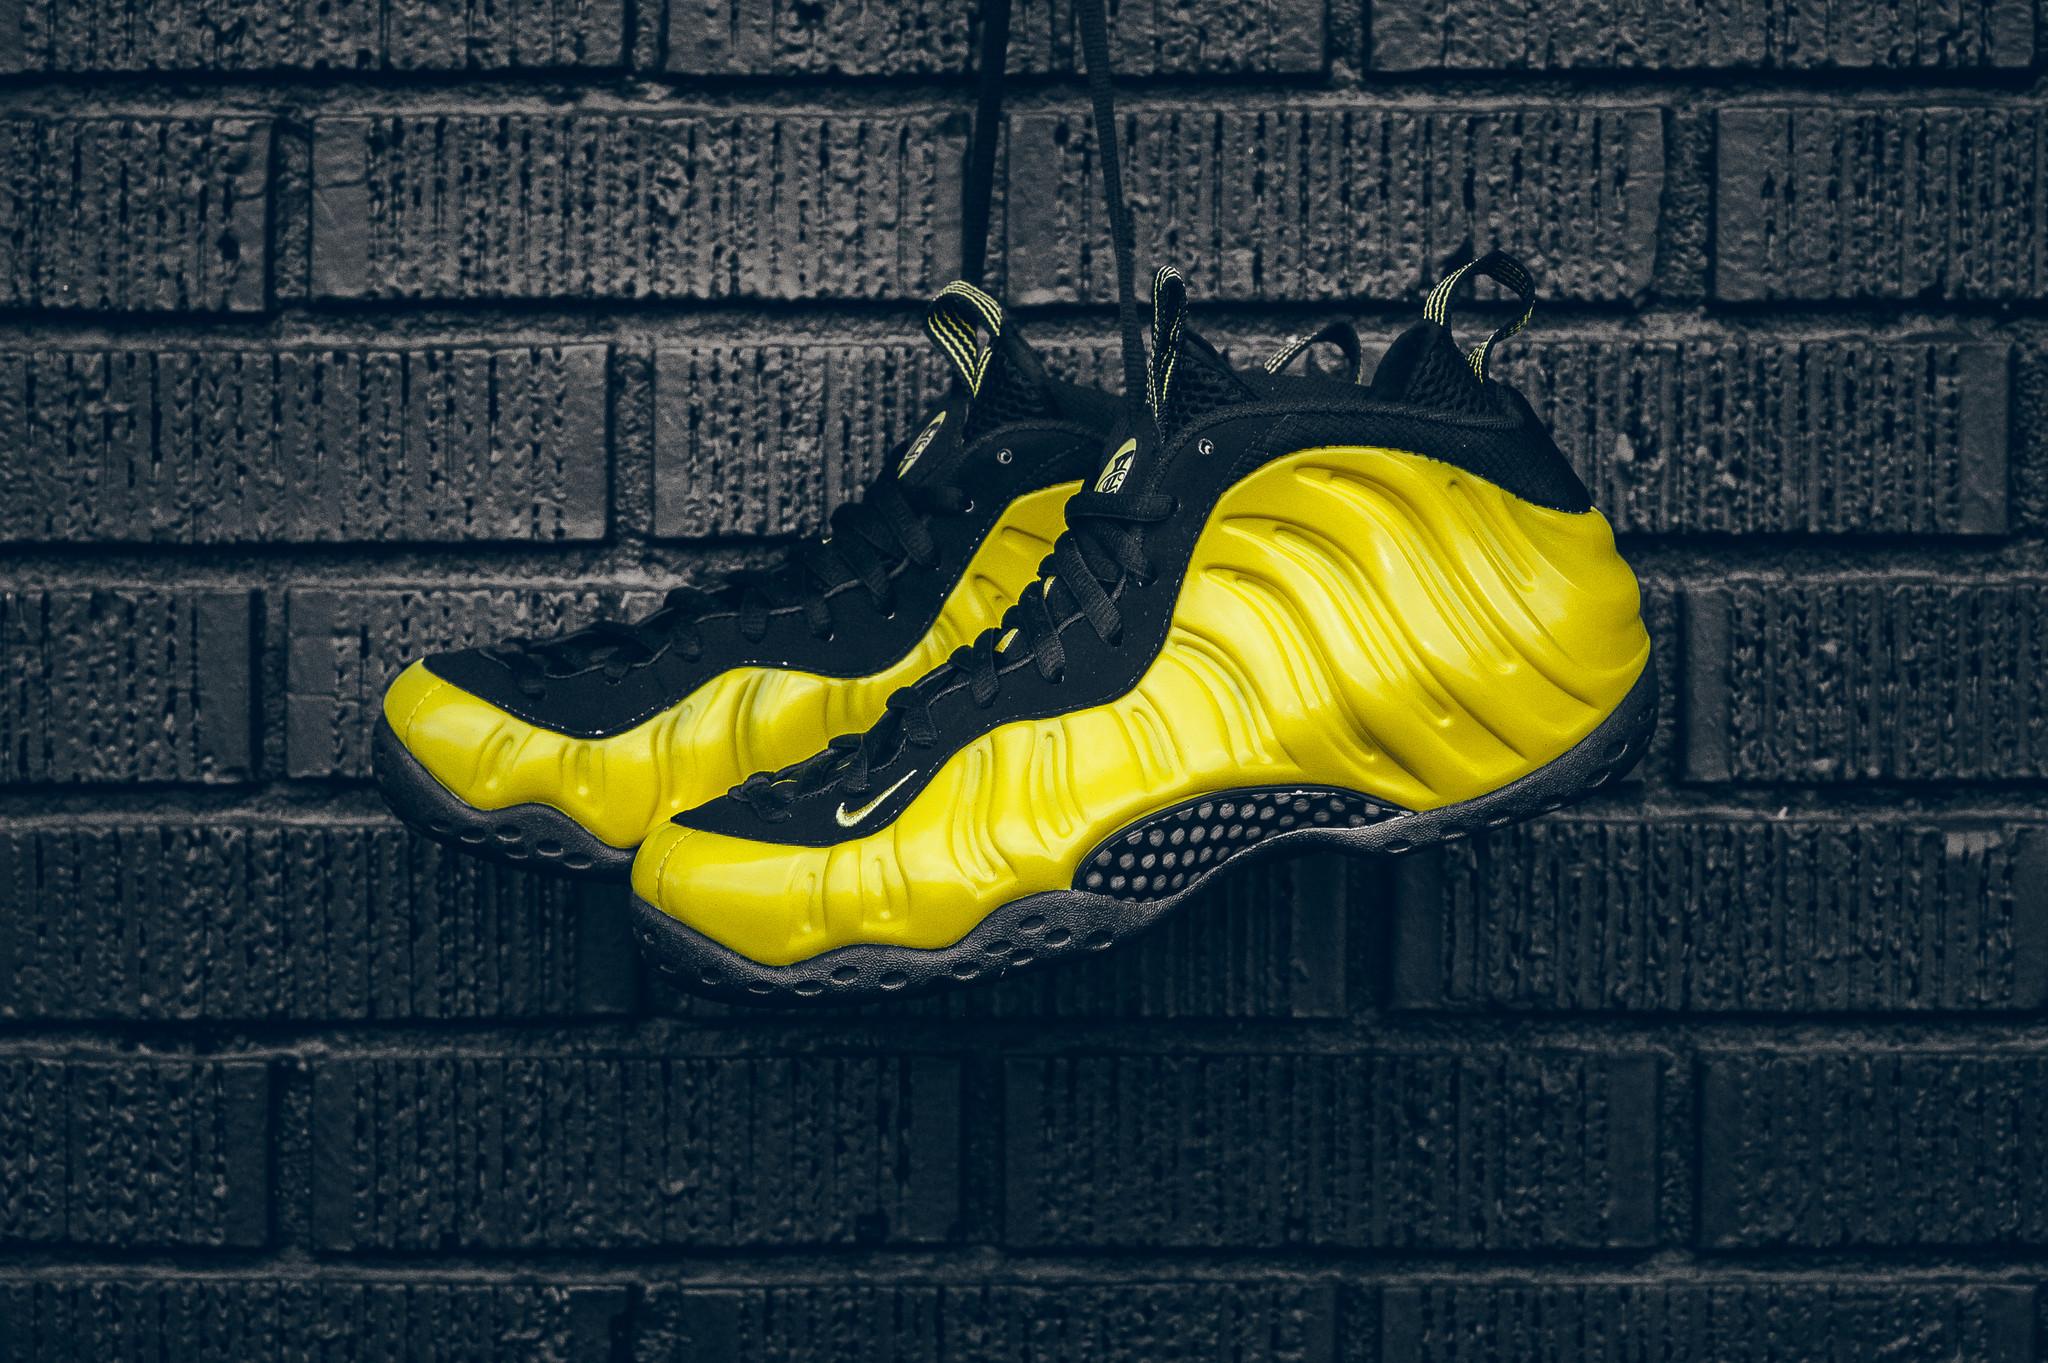 chaussure Nike Air Foamposite 'Wu Tang' (5)